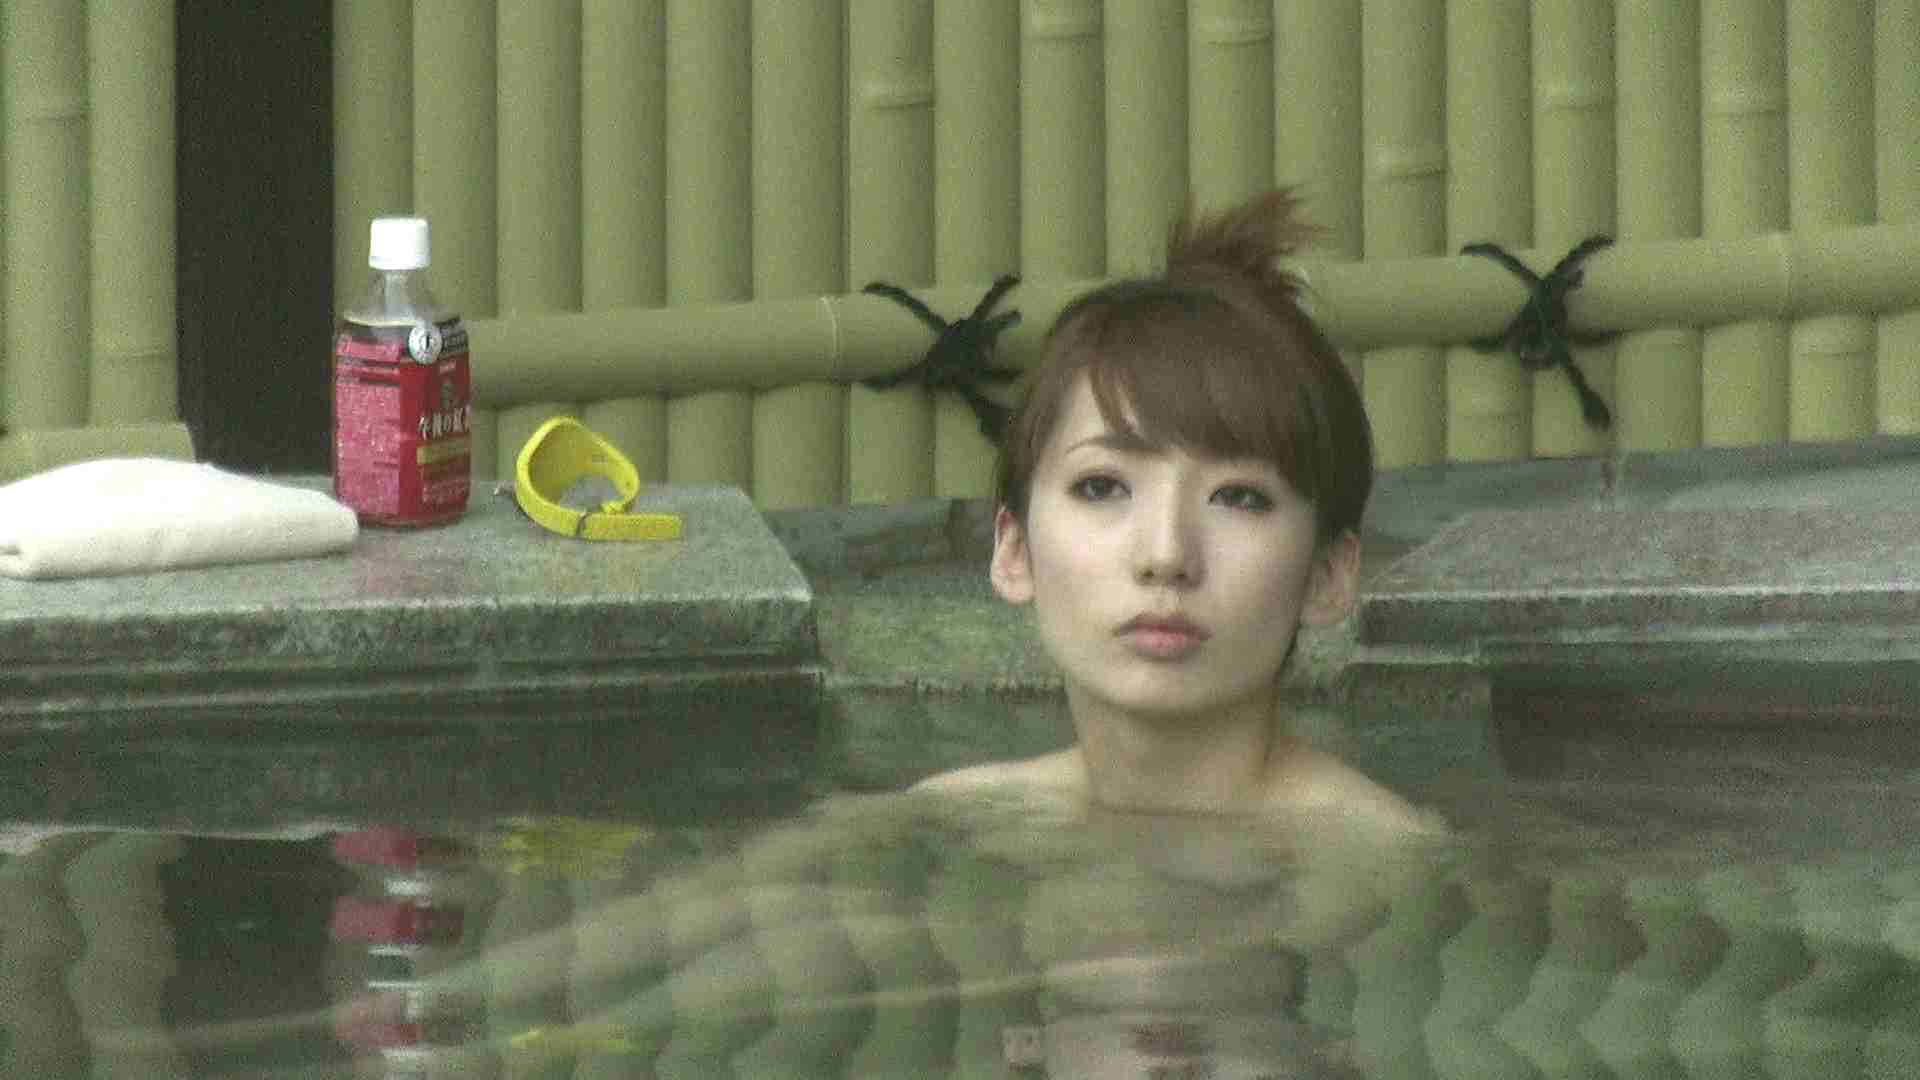 Aquaな露天風呂Vol.208 OLセックス   露天  85画像 25